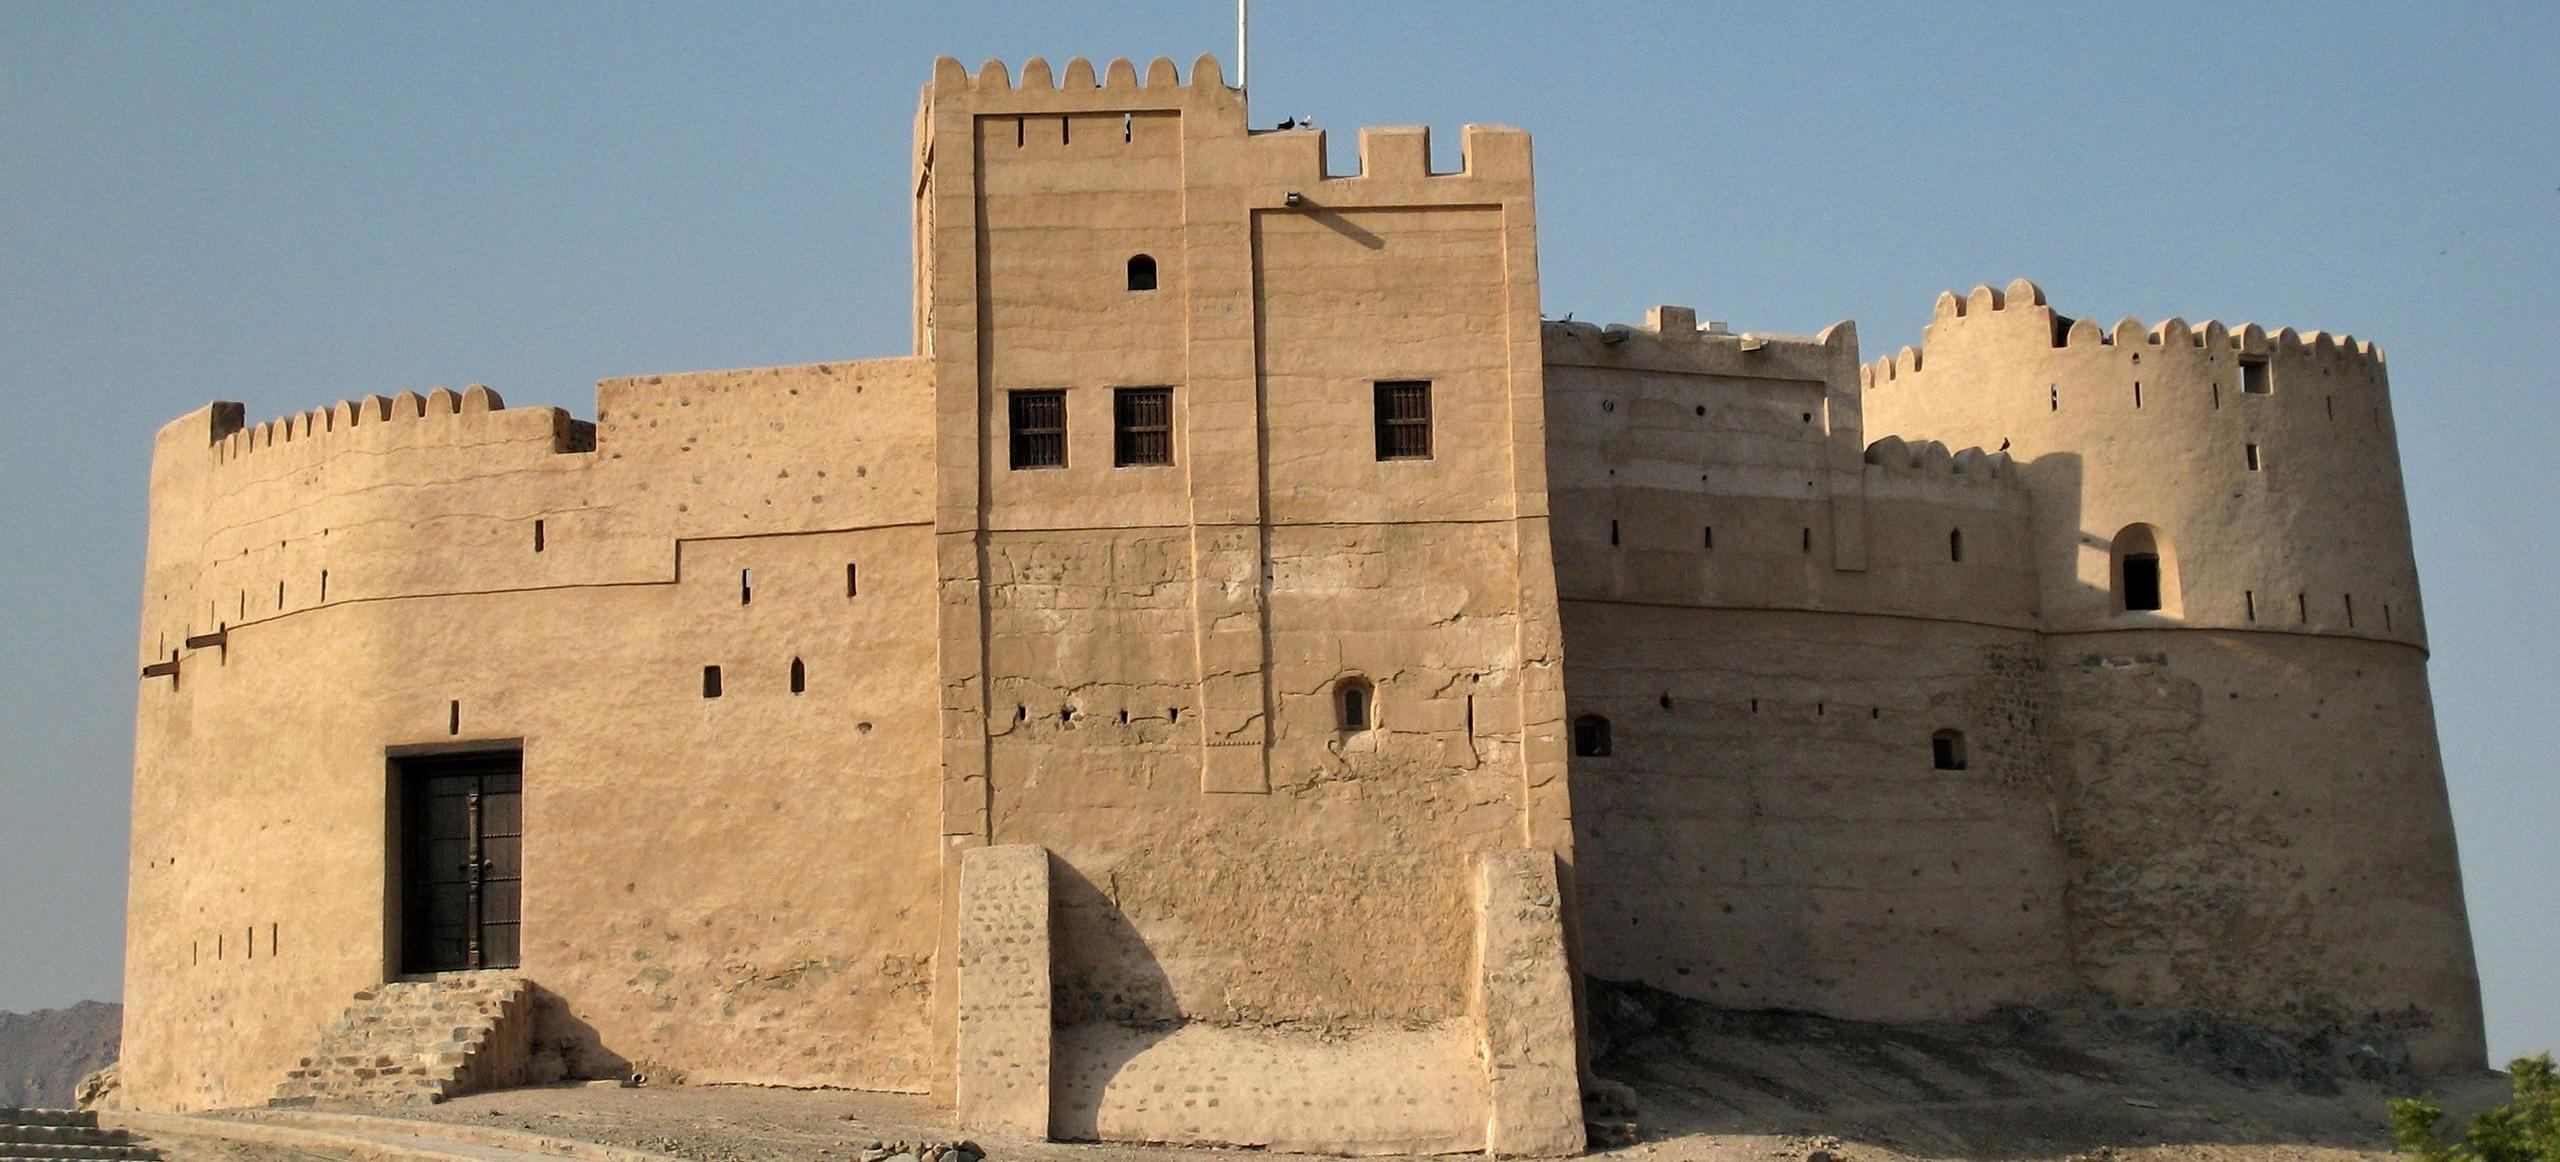 Big fujairah sightseeing united arab emirates